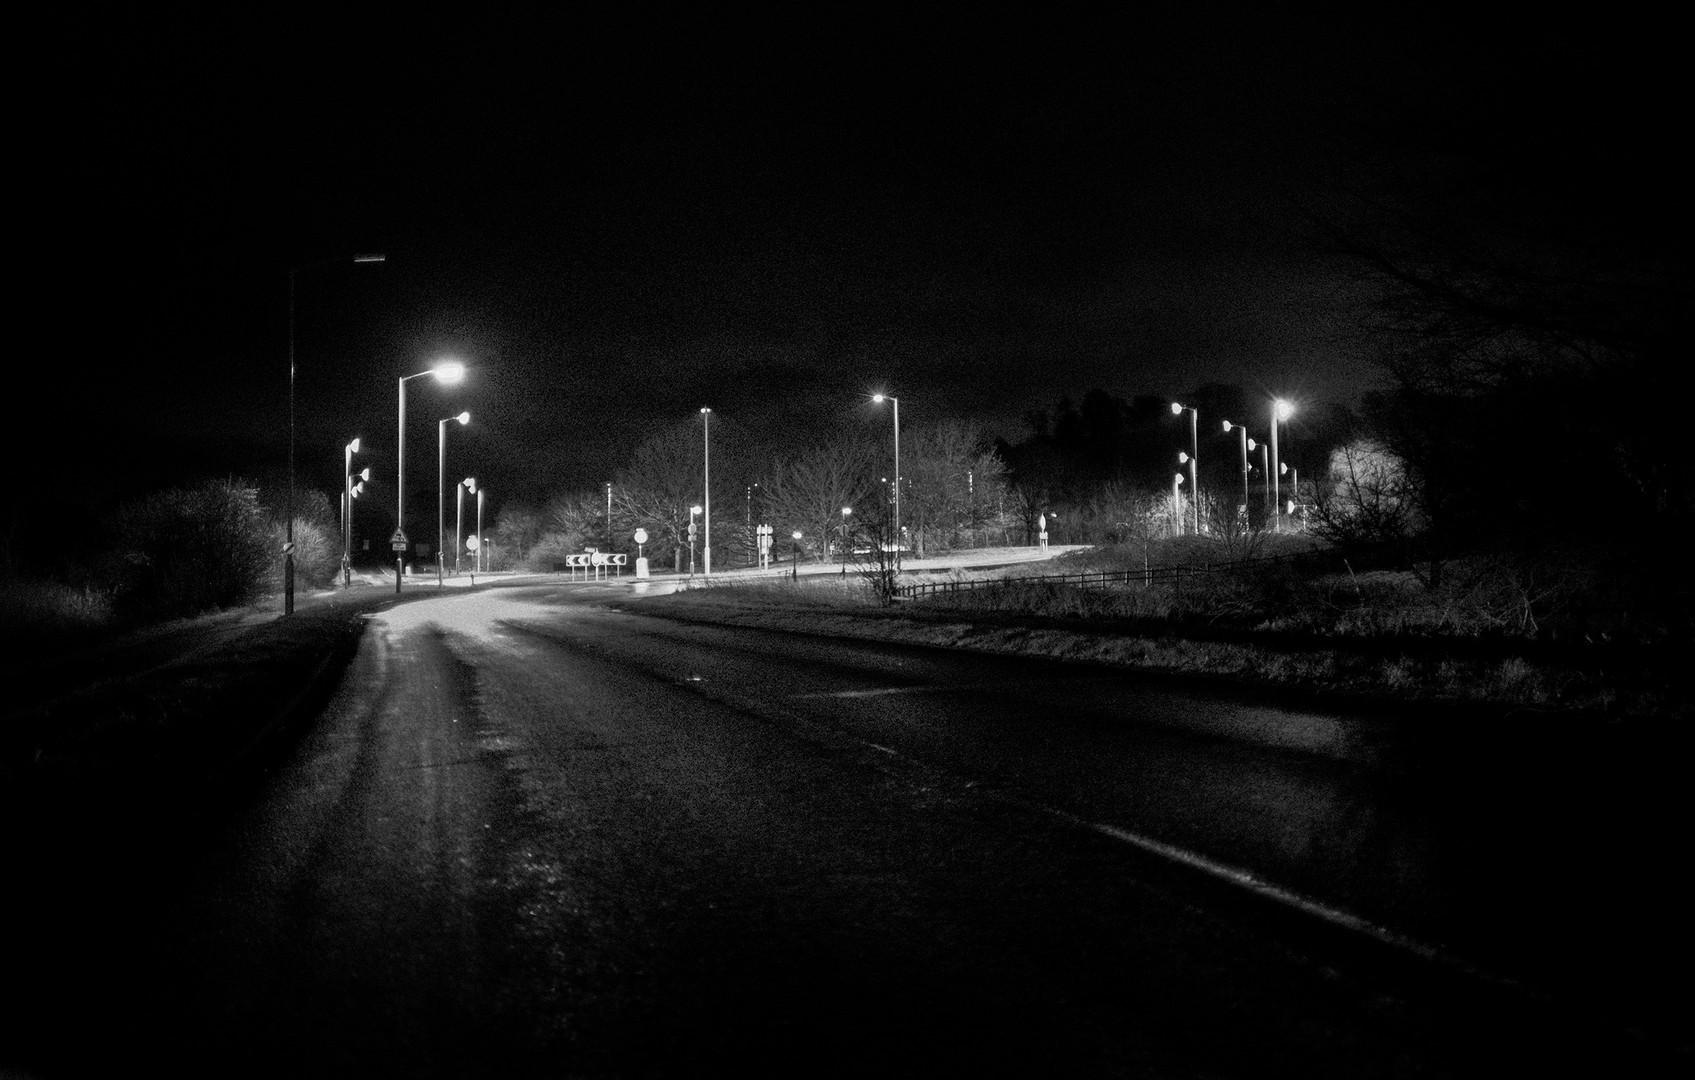 Lit roundabout